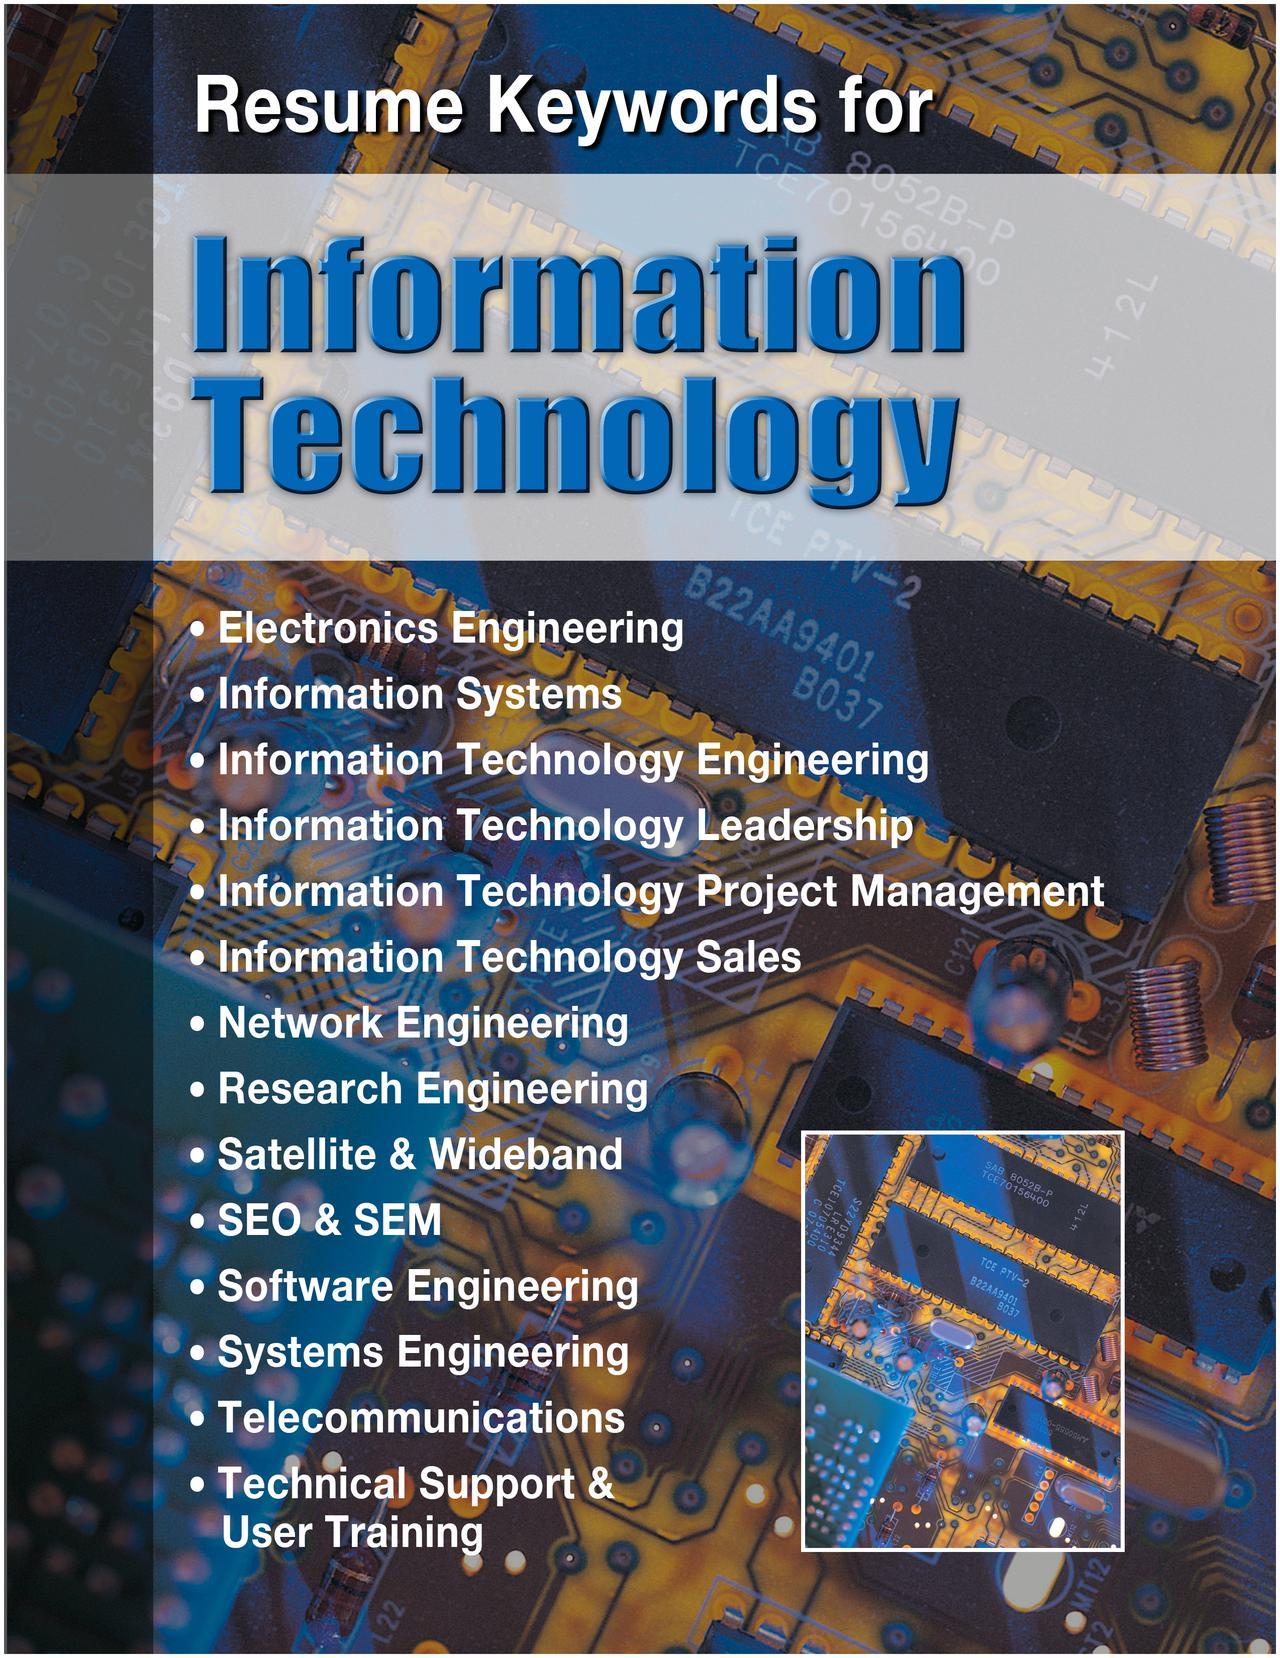 information technology divider.jpg